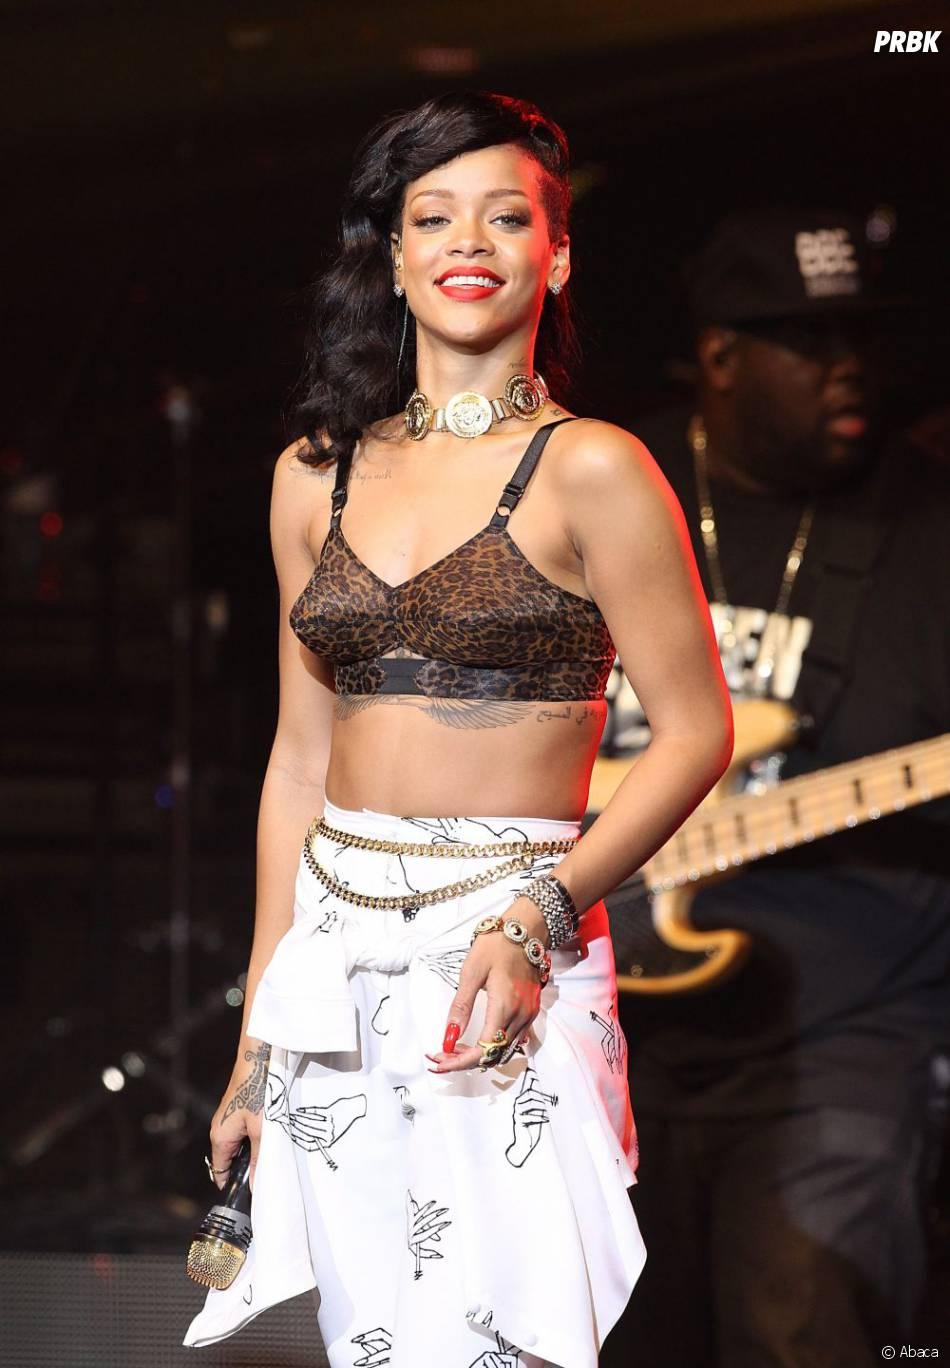 Rihanna adore poster des photos sexy pour démentir les rumeurs